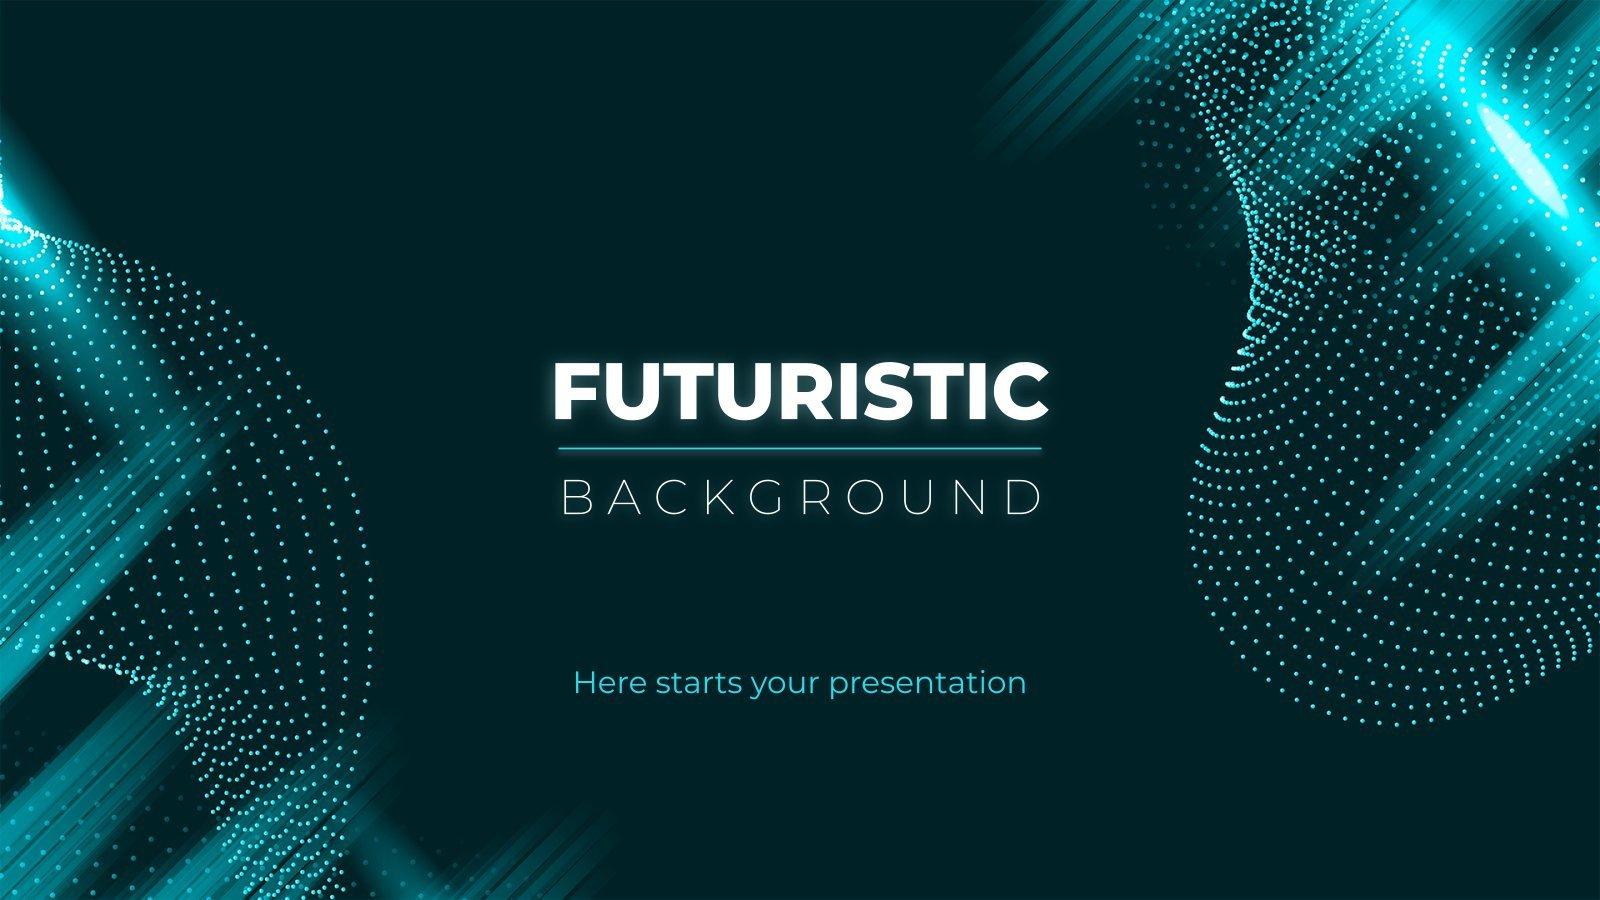 Futuristic Background presentation template